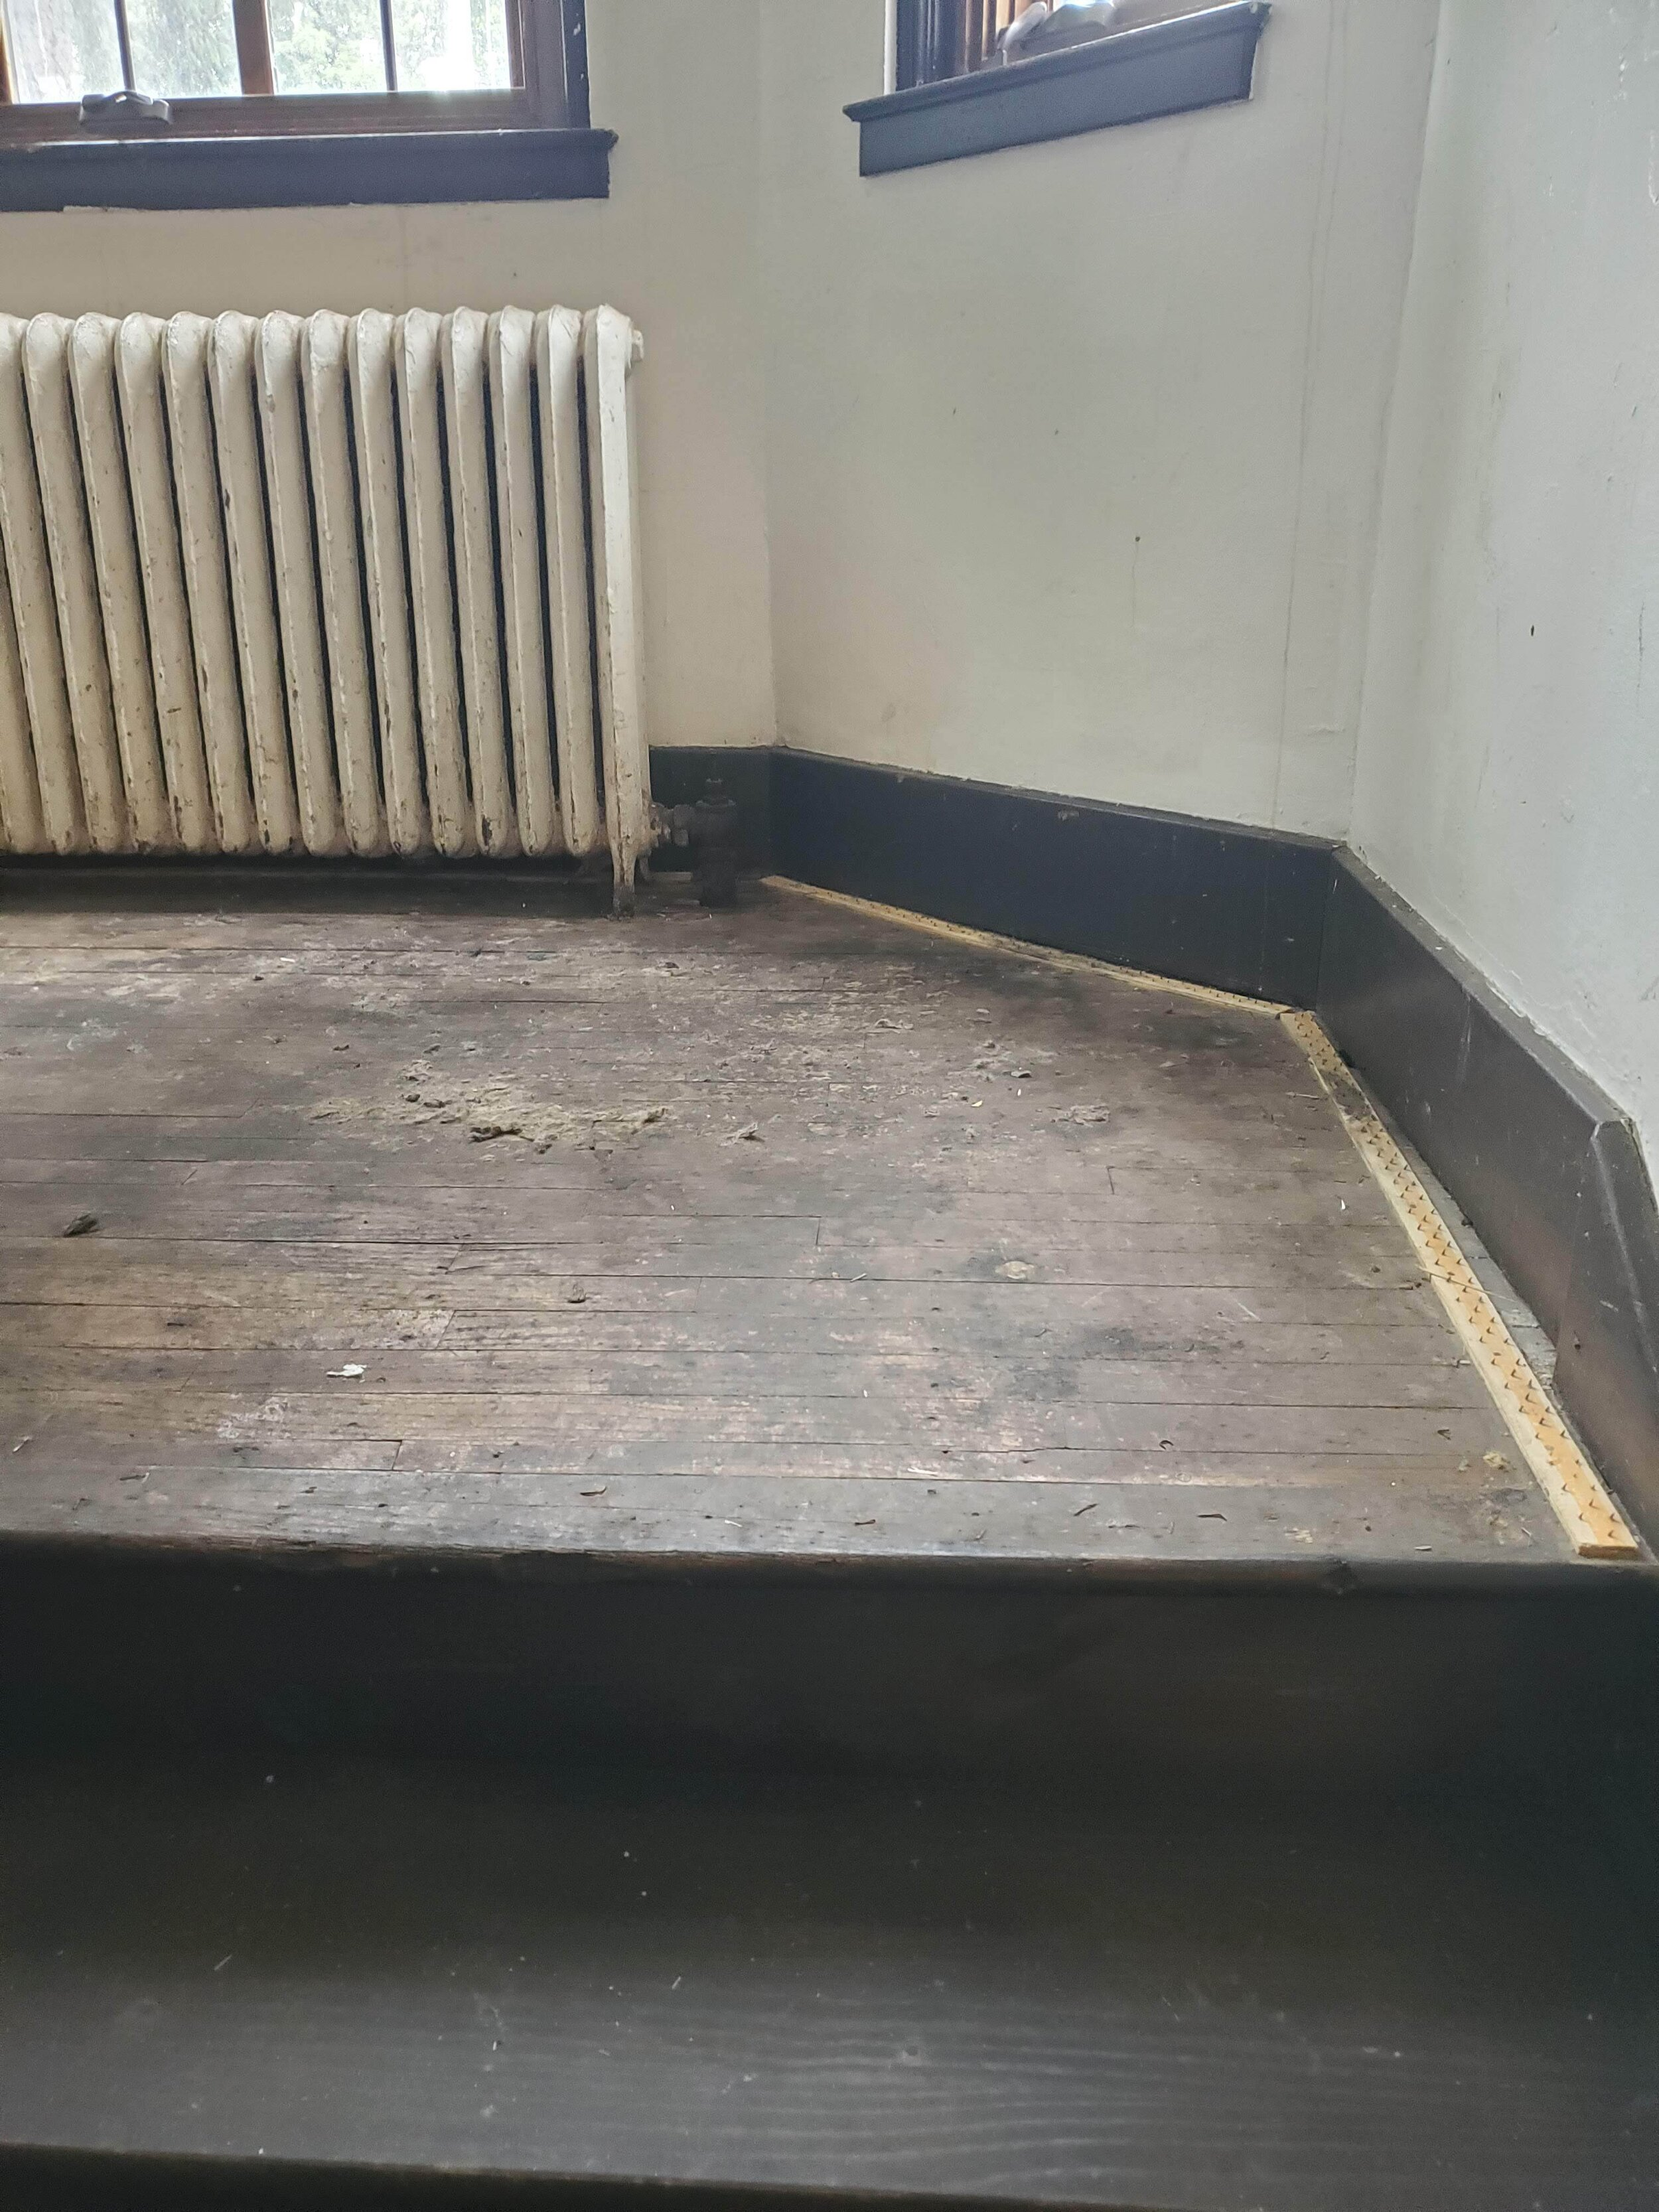 2019 First Floor Front Stair Renovation 20190903_112755.jpg